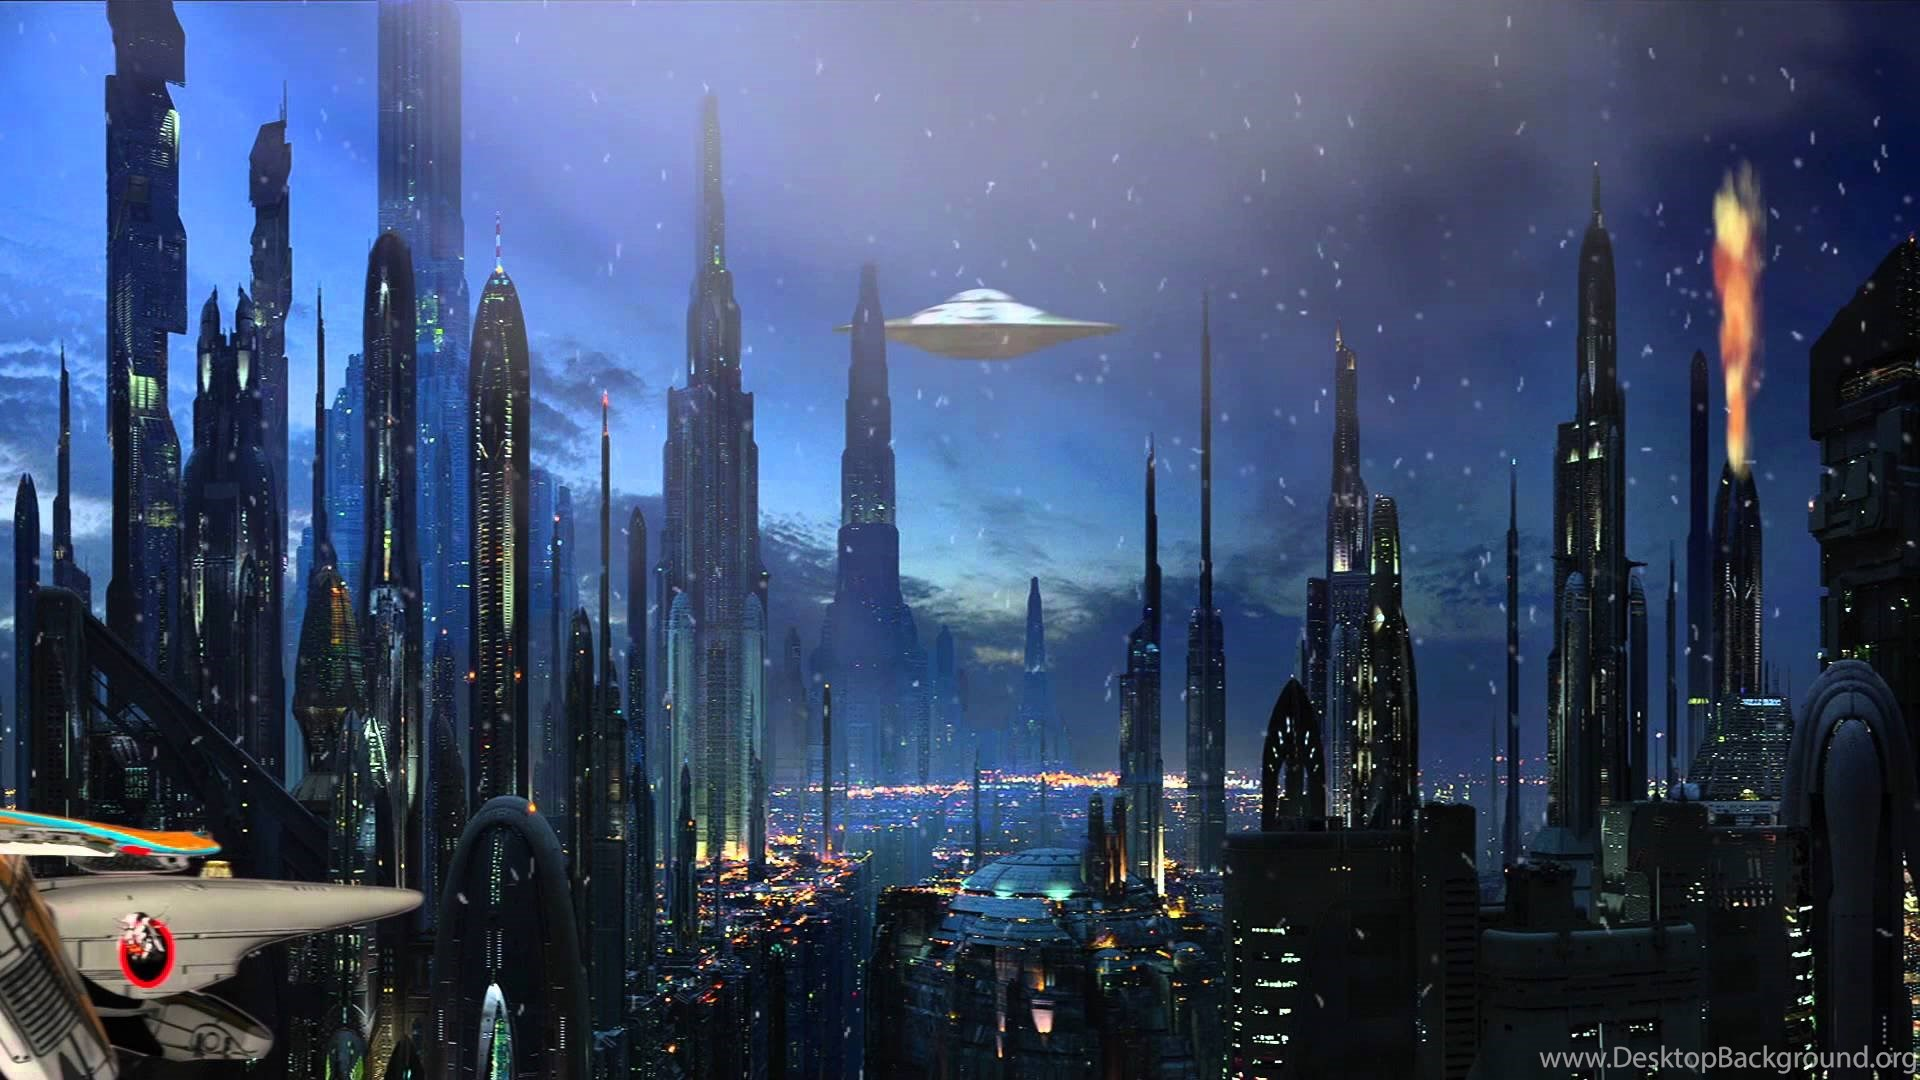 Space City Animation Youtube Desktop Background